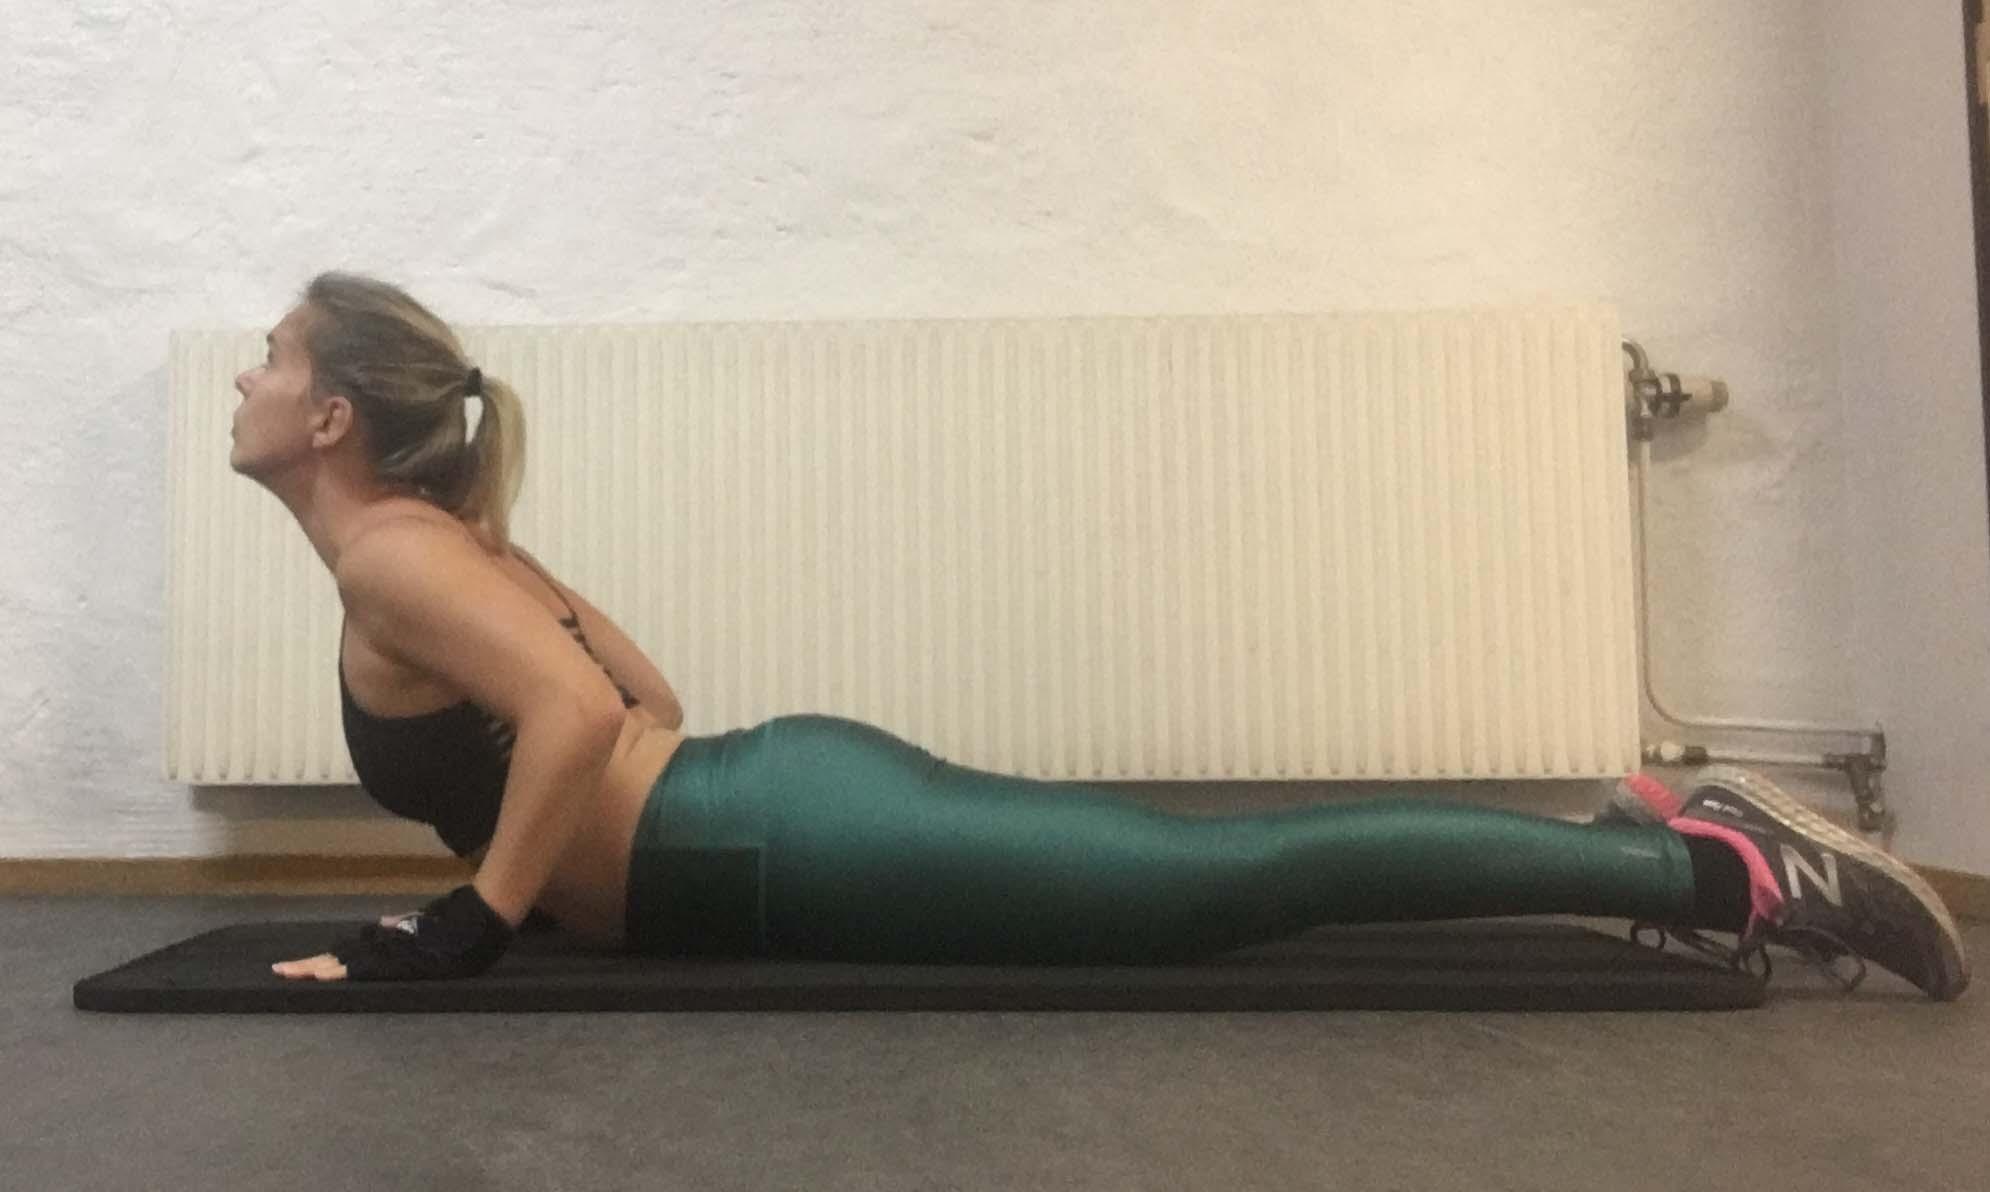 Kobran yogaposition yogaövning yoga kobra, halv kobra